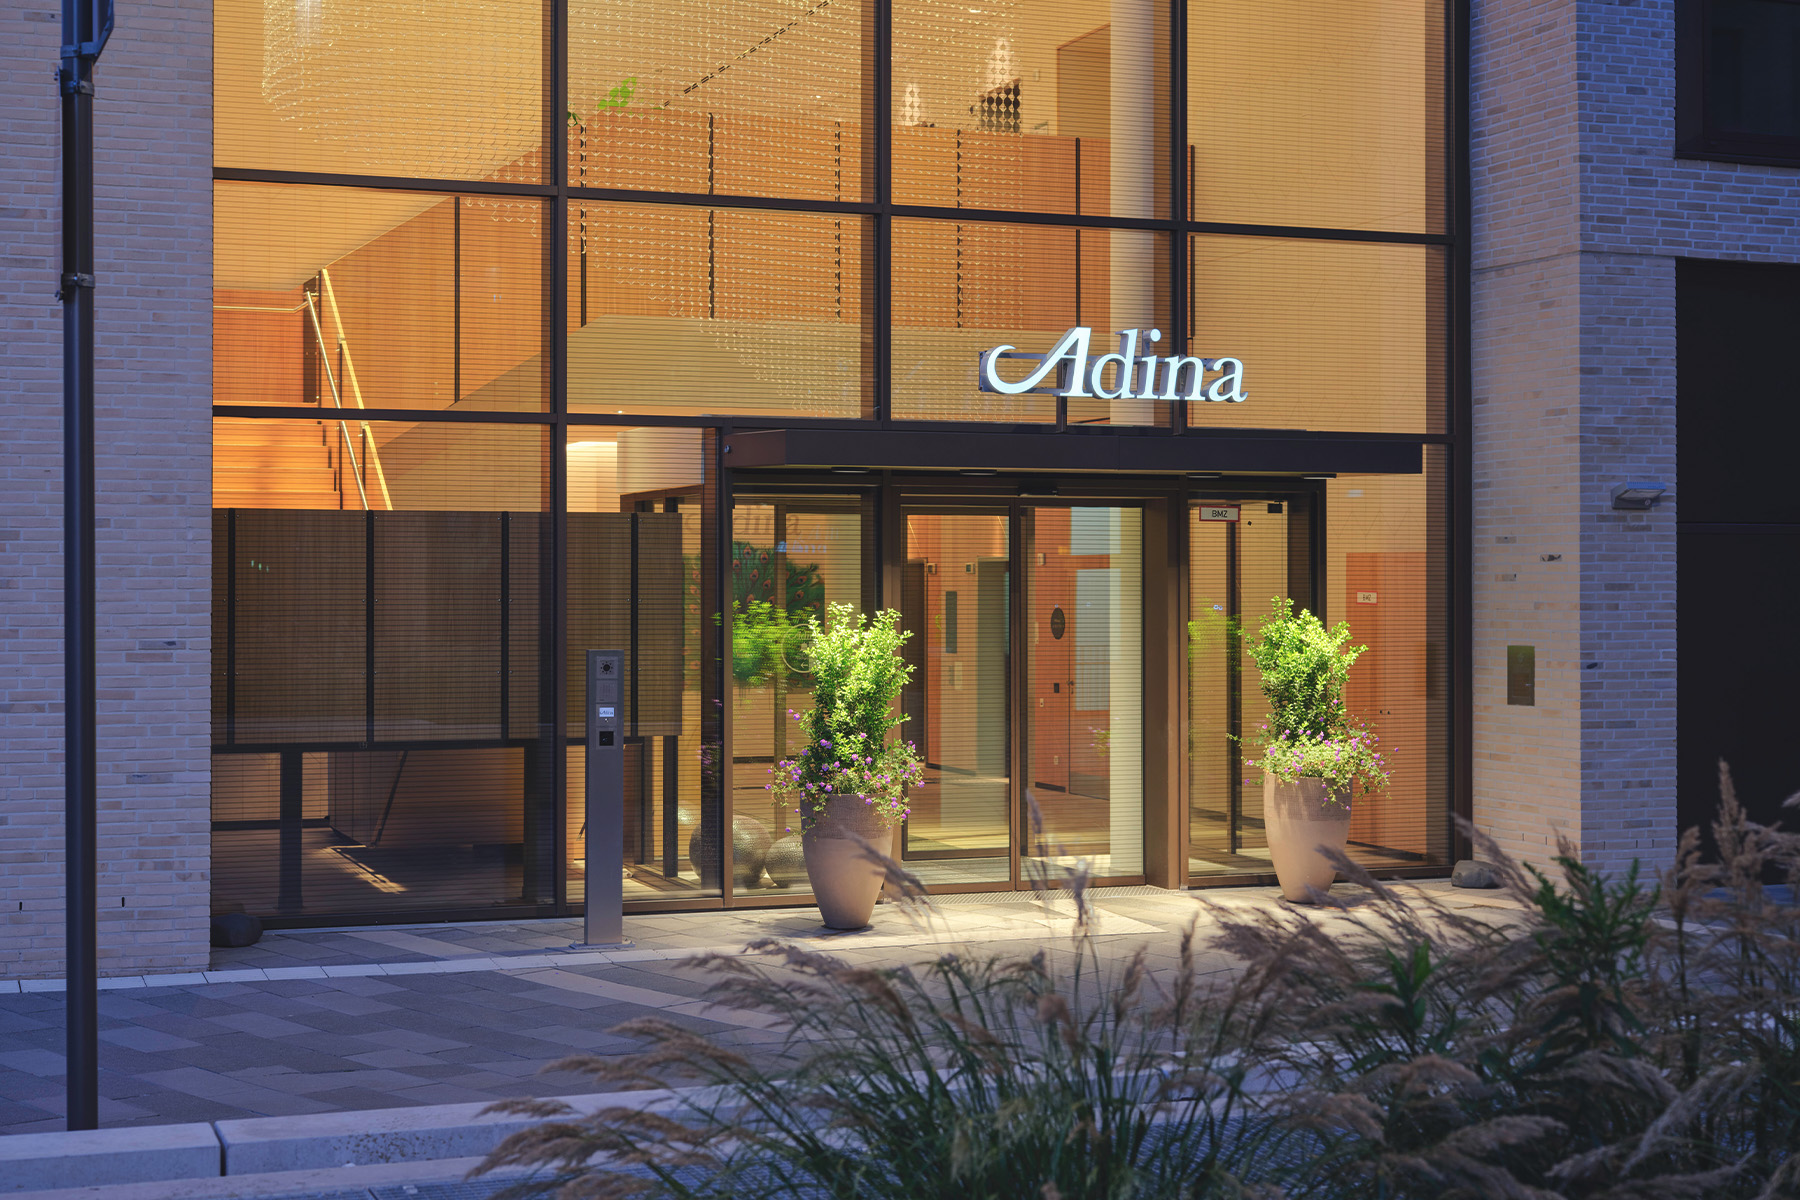 Adina Frontansicht Koeln 1 Artikel – ©Adina Hotels